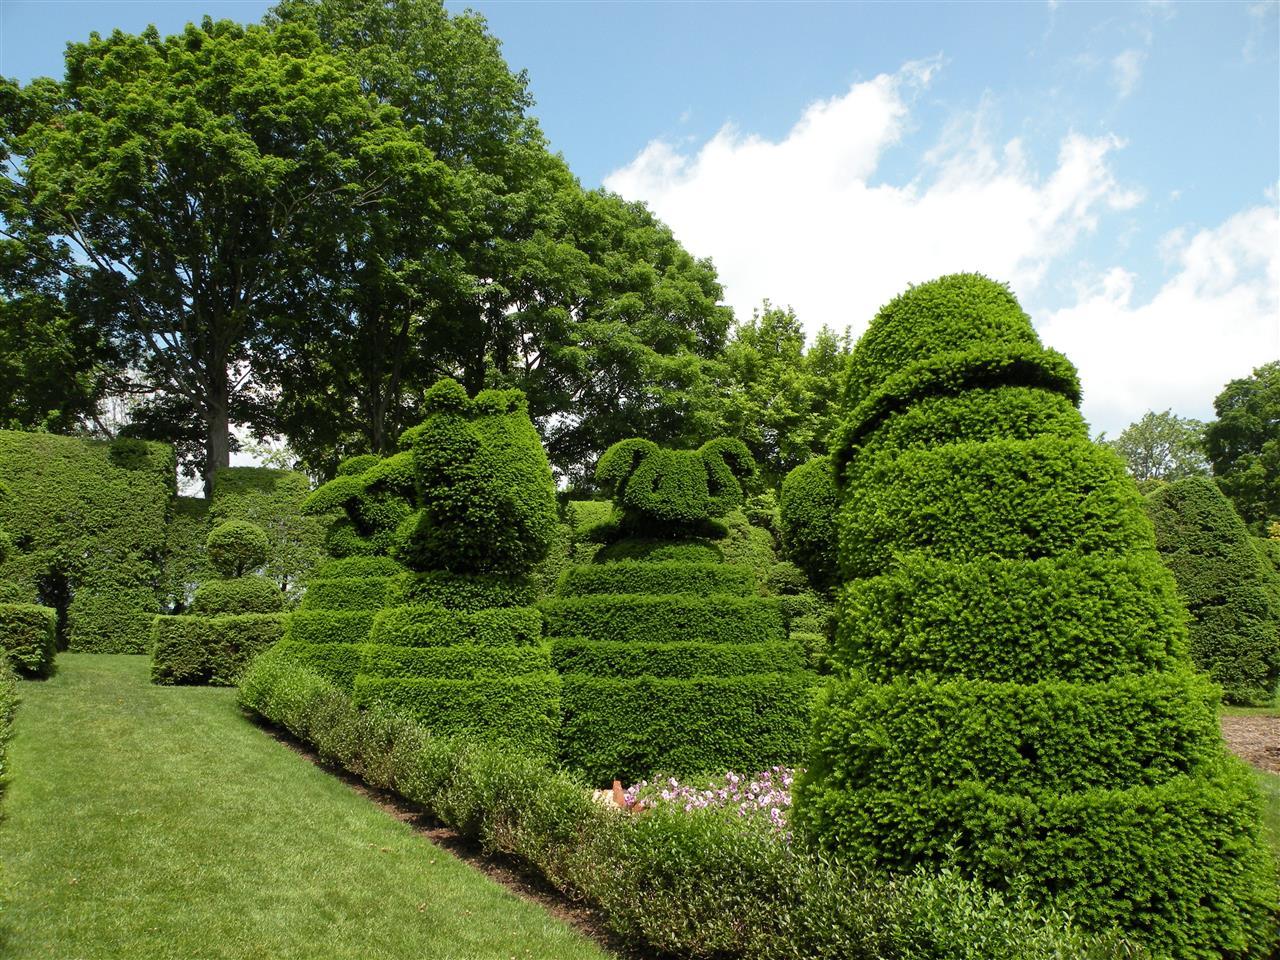 Figure plants at Ladew Topiary Garden, Monkton, MD